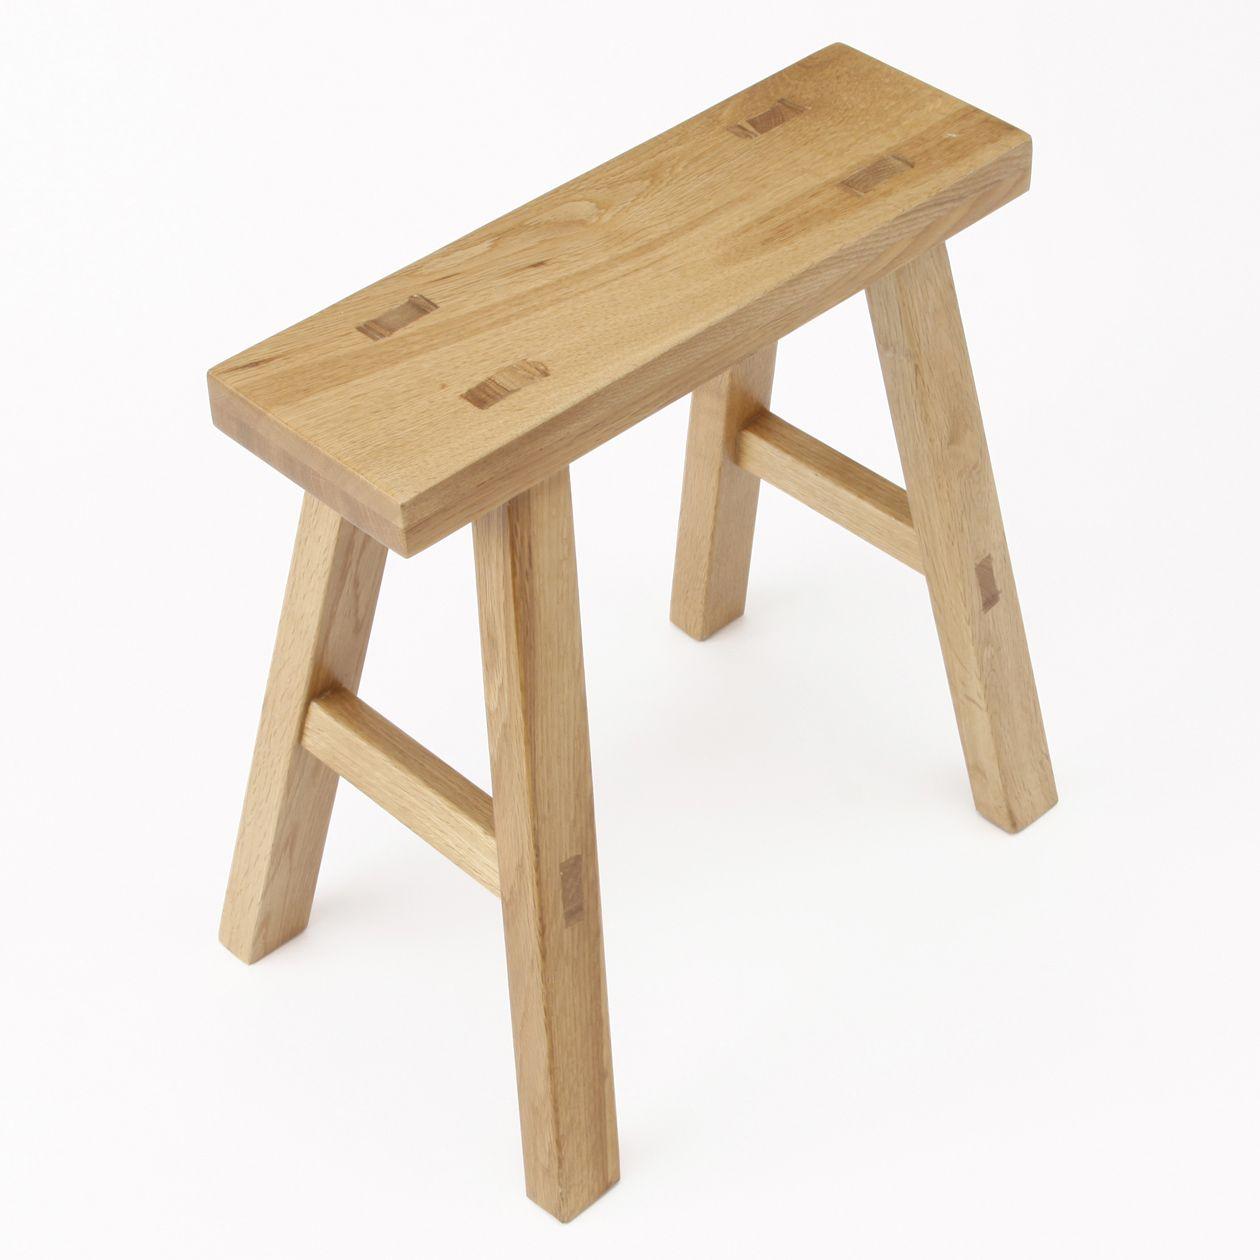 Oak Bench Small Muji 95 Ea Chairs Pinterest